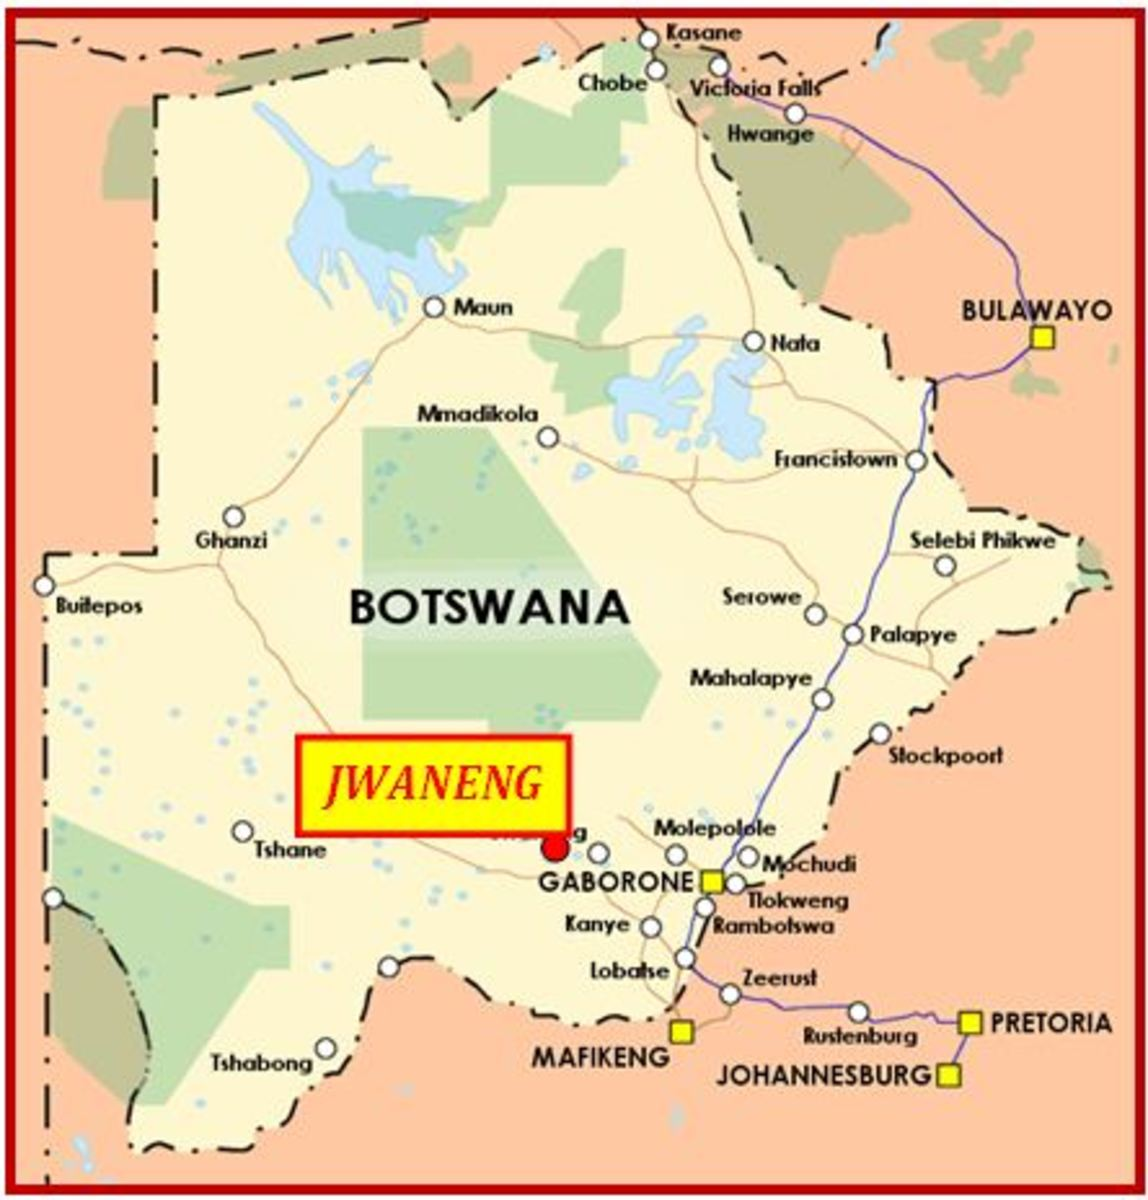 Jwaneng highlighted in Botswana